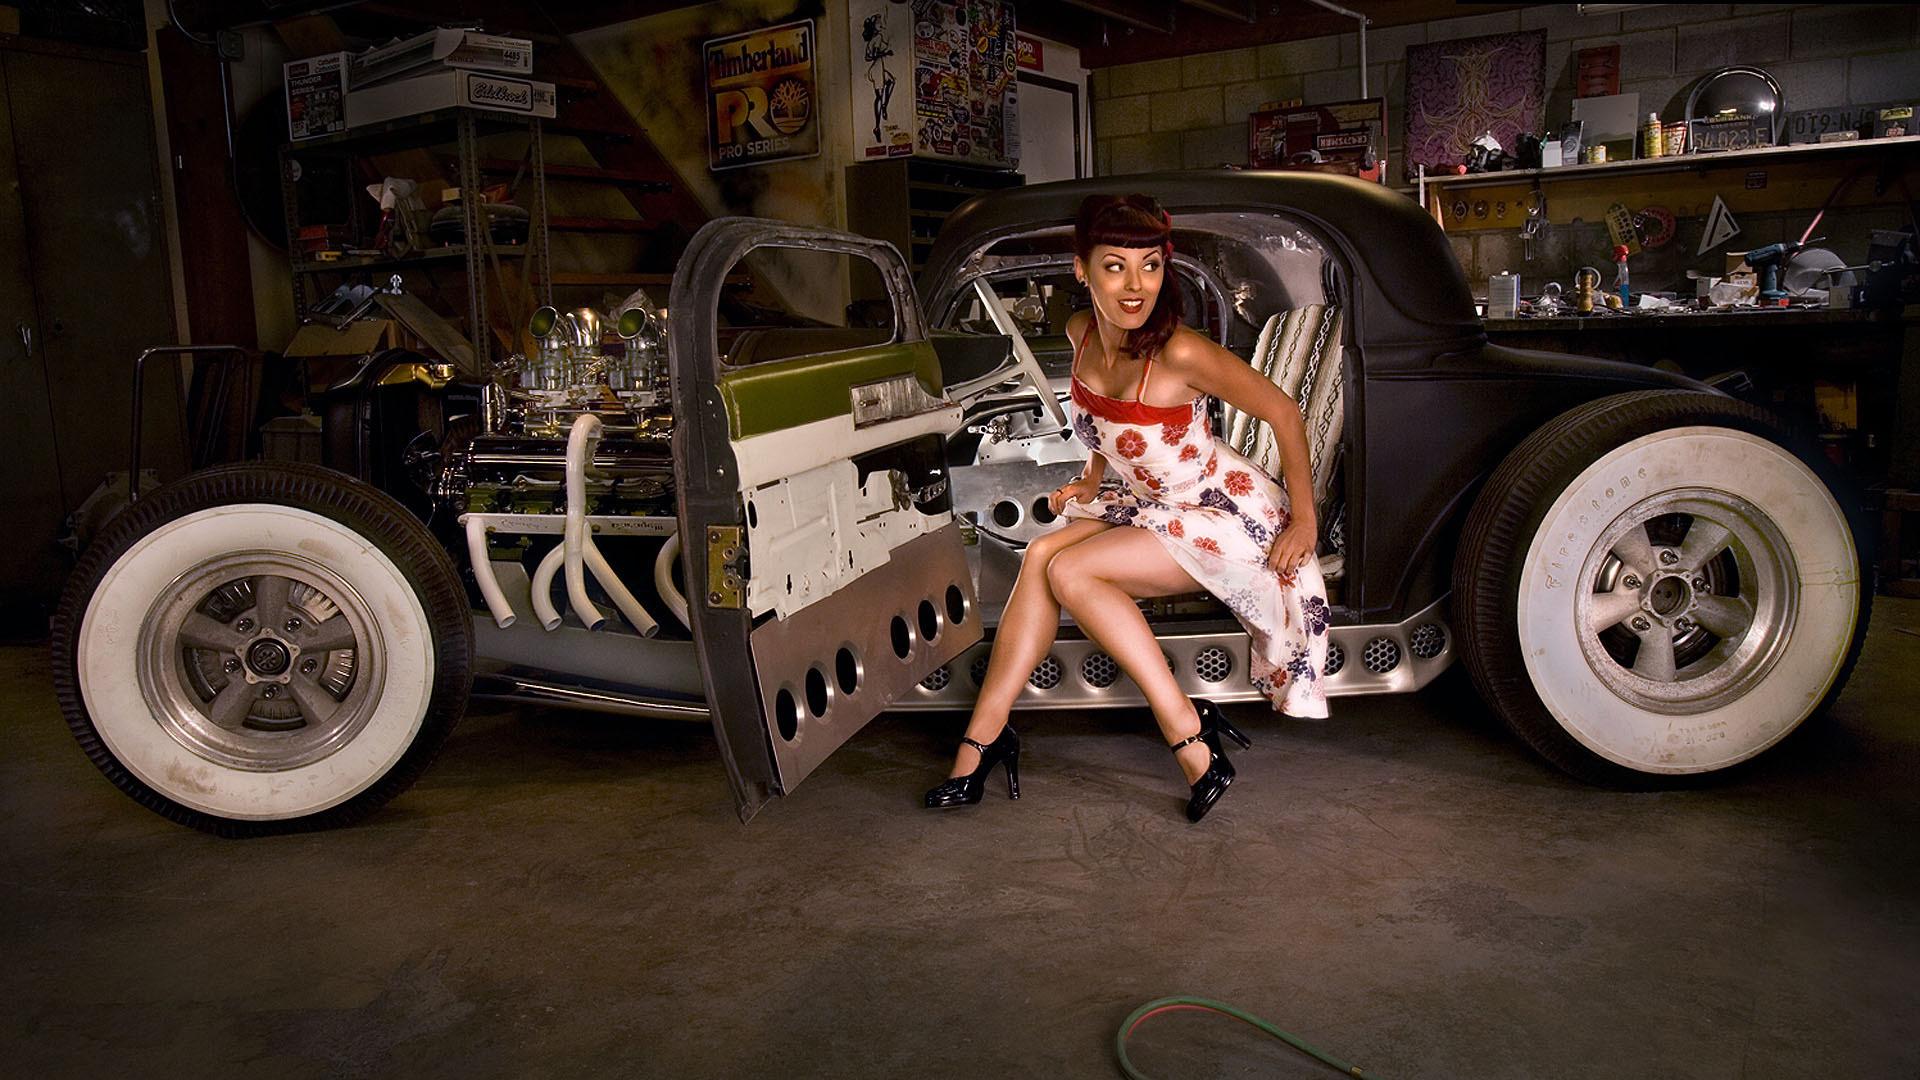 Hot Rod Pin Up Wallpaper | Pin-up girl in Hot Rod HD Wallpaper 1920×1080